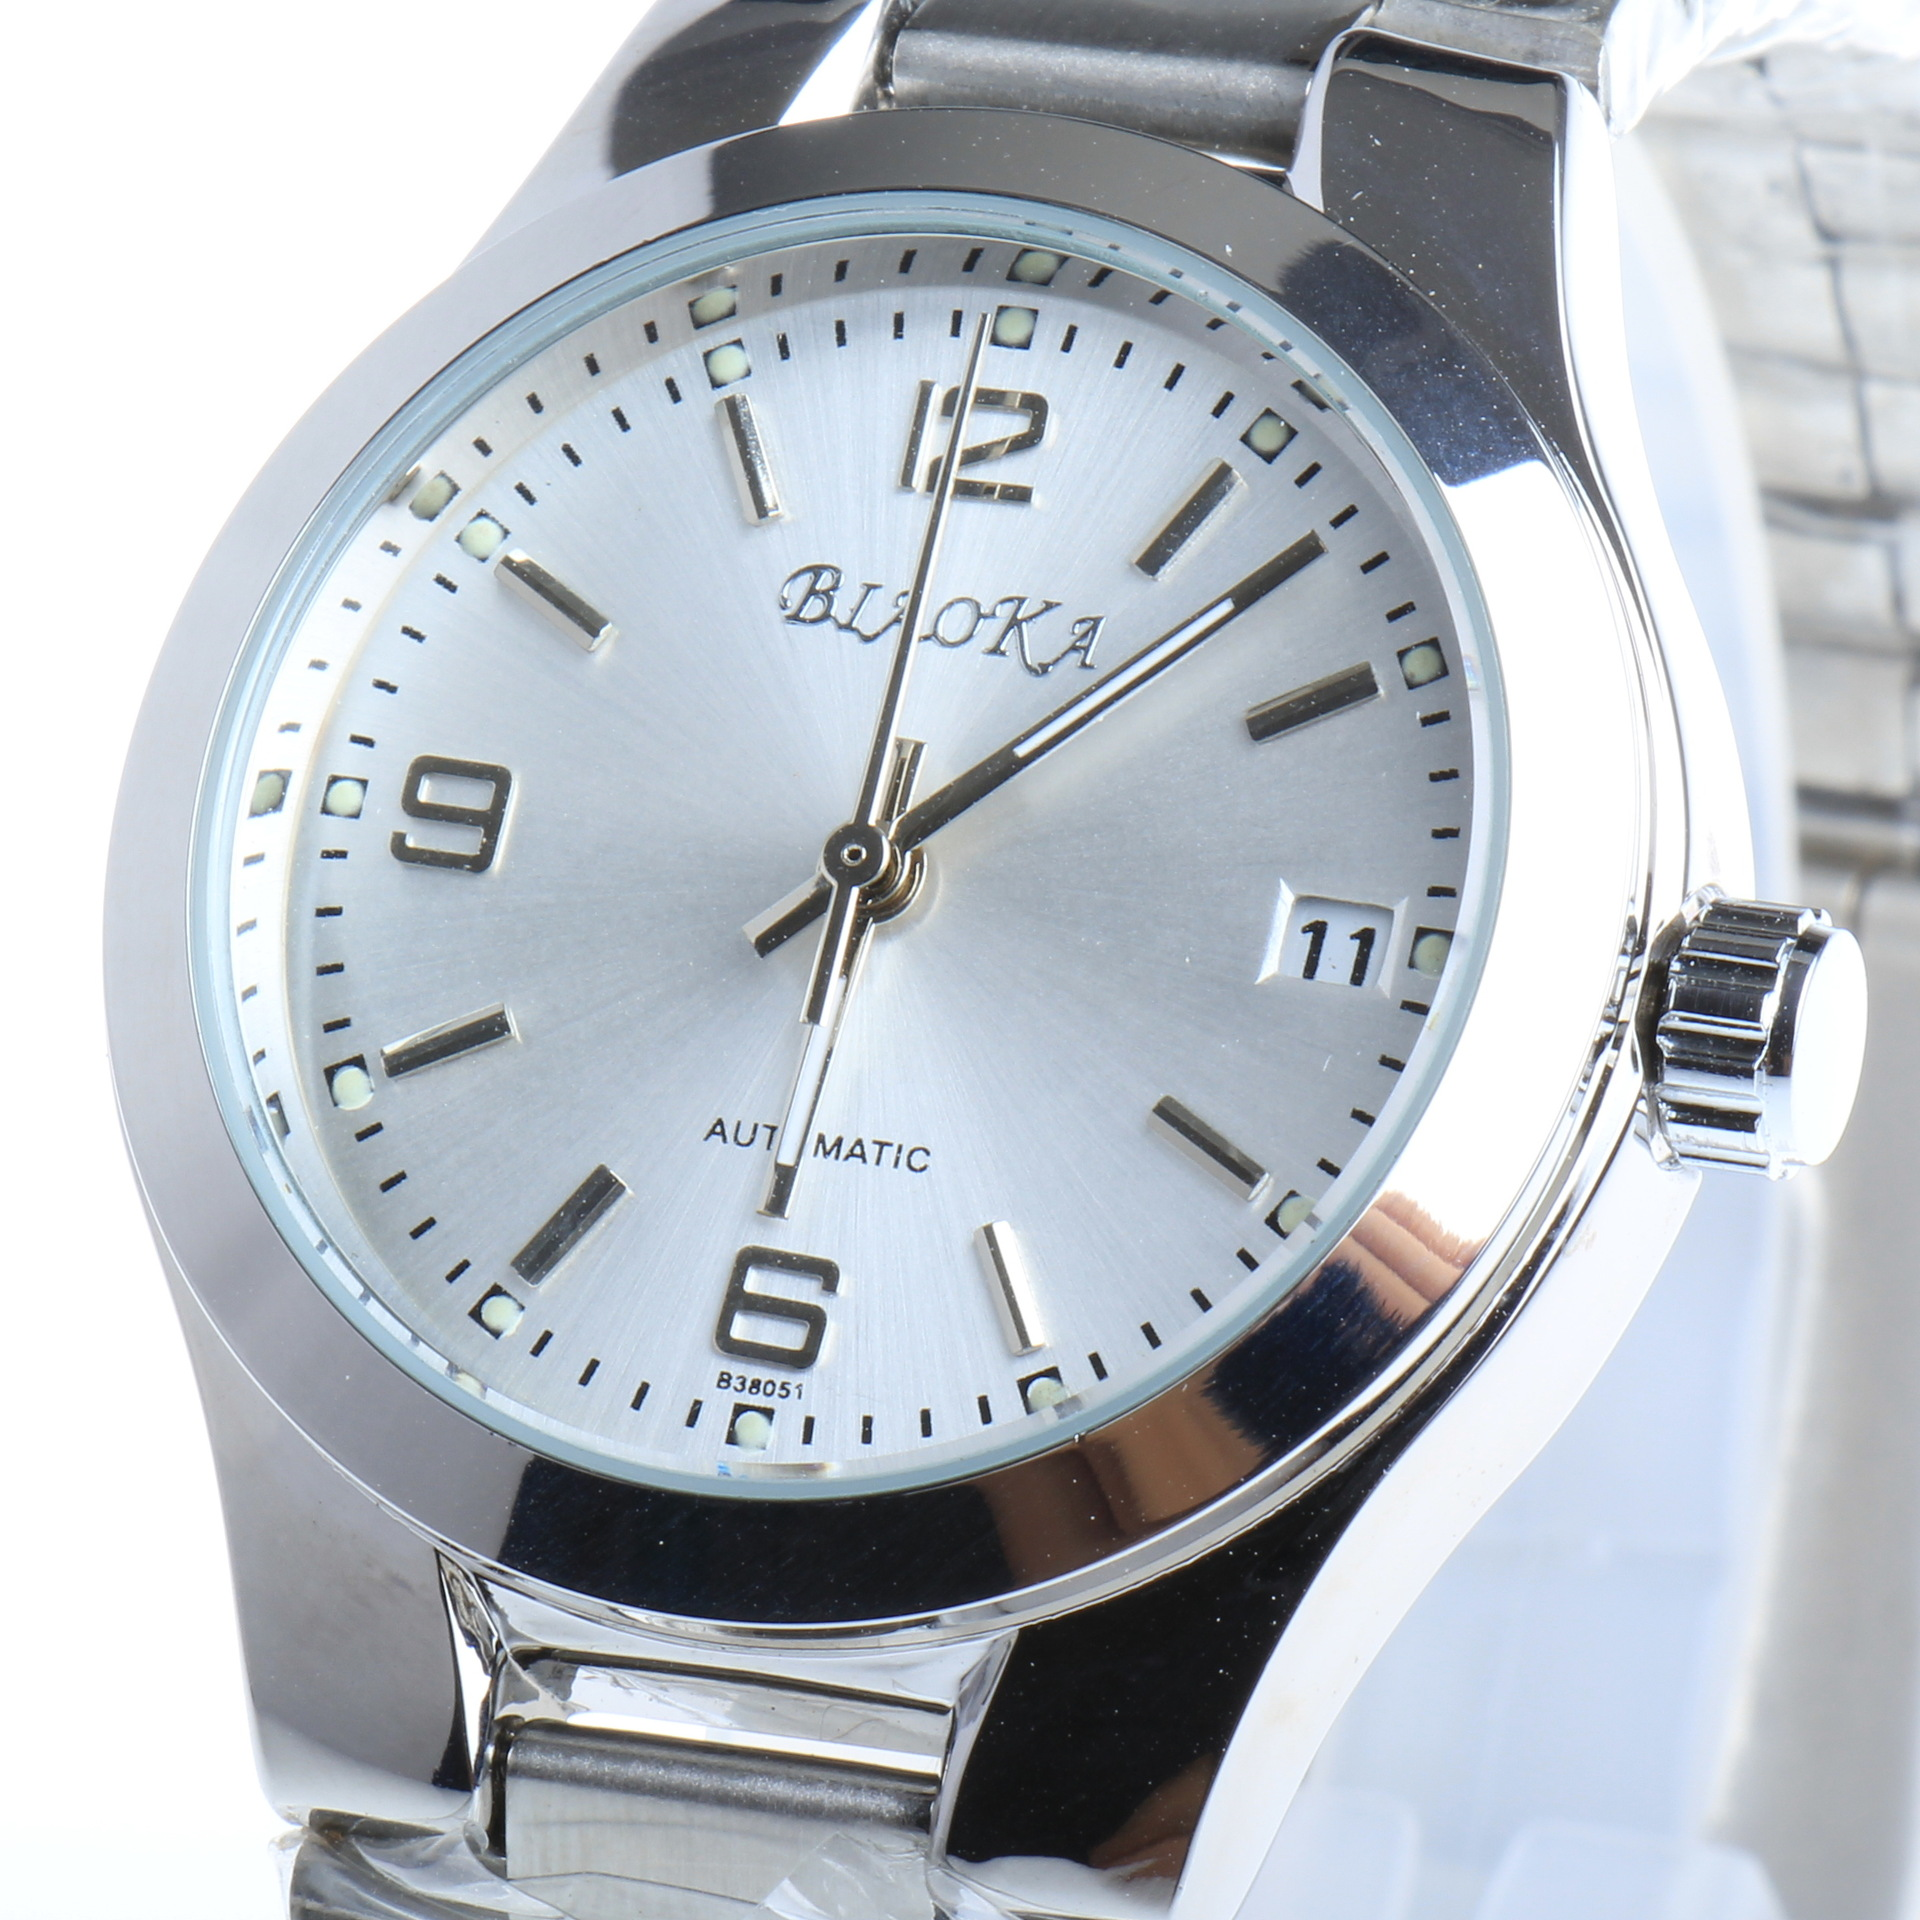 2016 Luxury Brand BIAOKA Watches Men Mechanical Fashion Casual Male Sports Waterproof Watch Steel Gold Skeleton